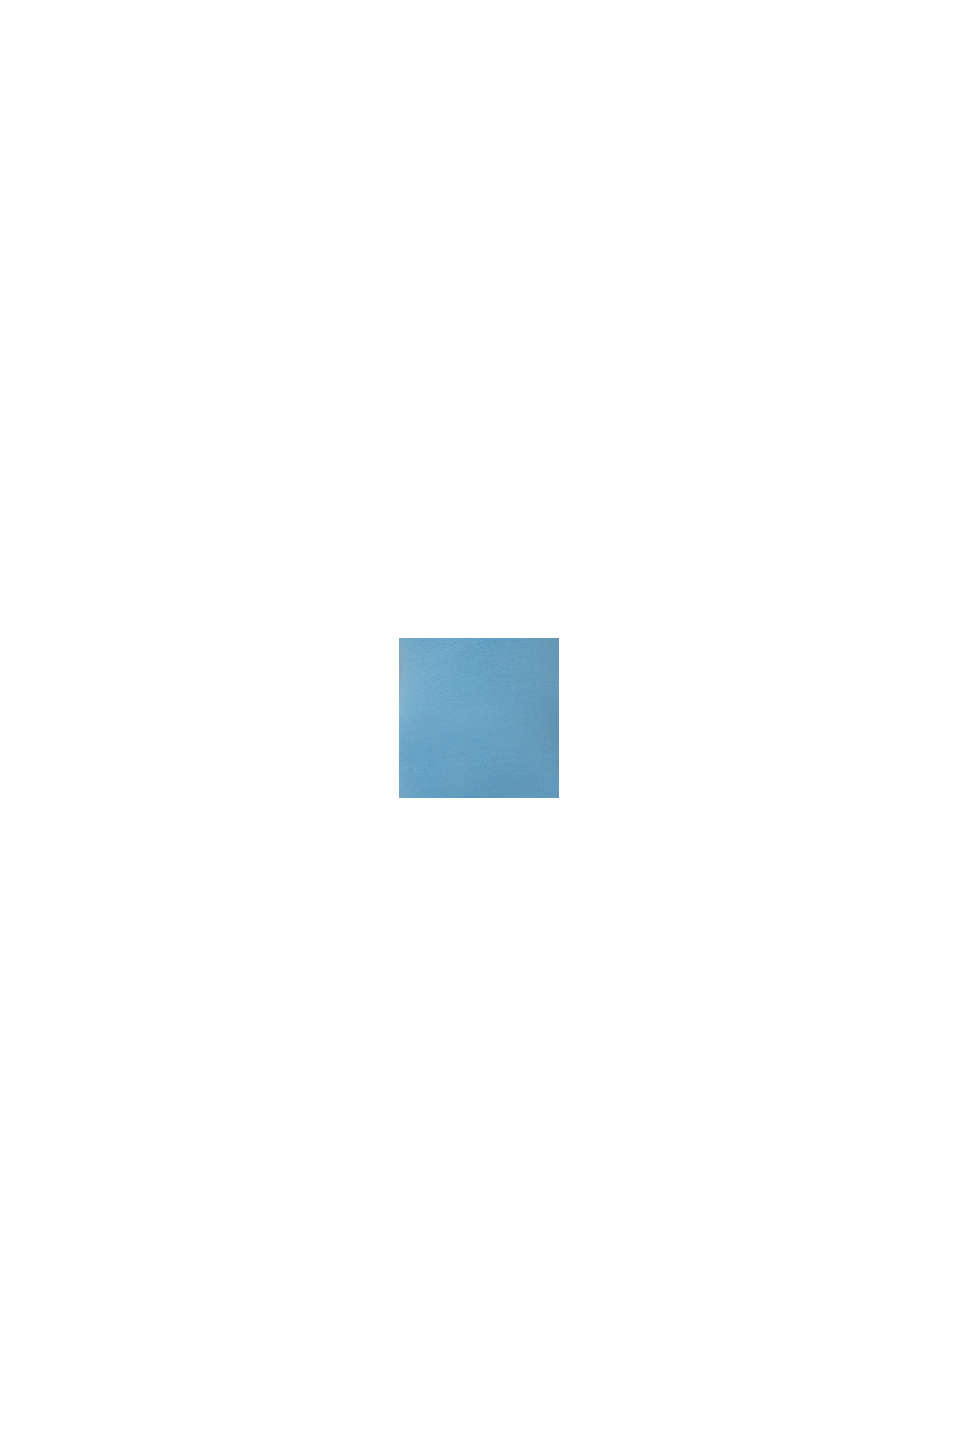 Stretchtop met voedingsfunctie, SHADOW BLUE, swatch